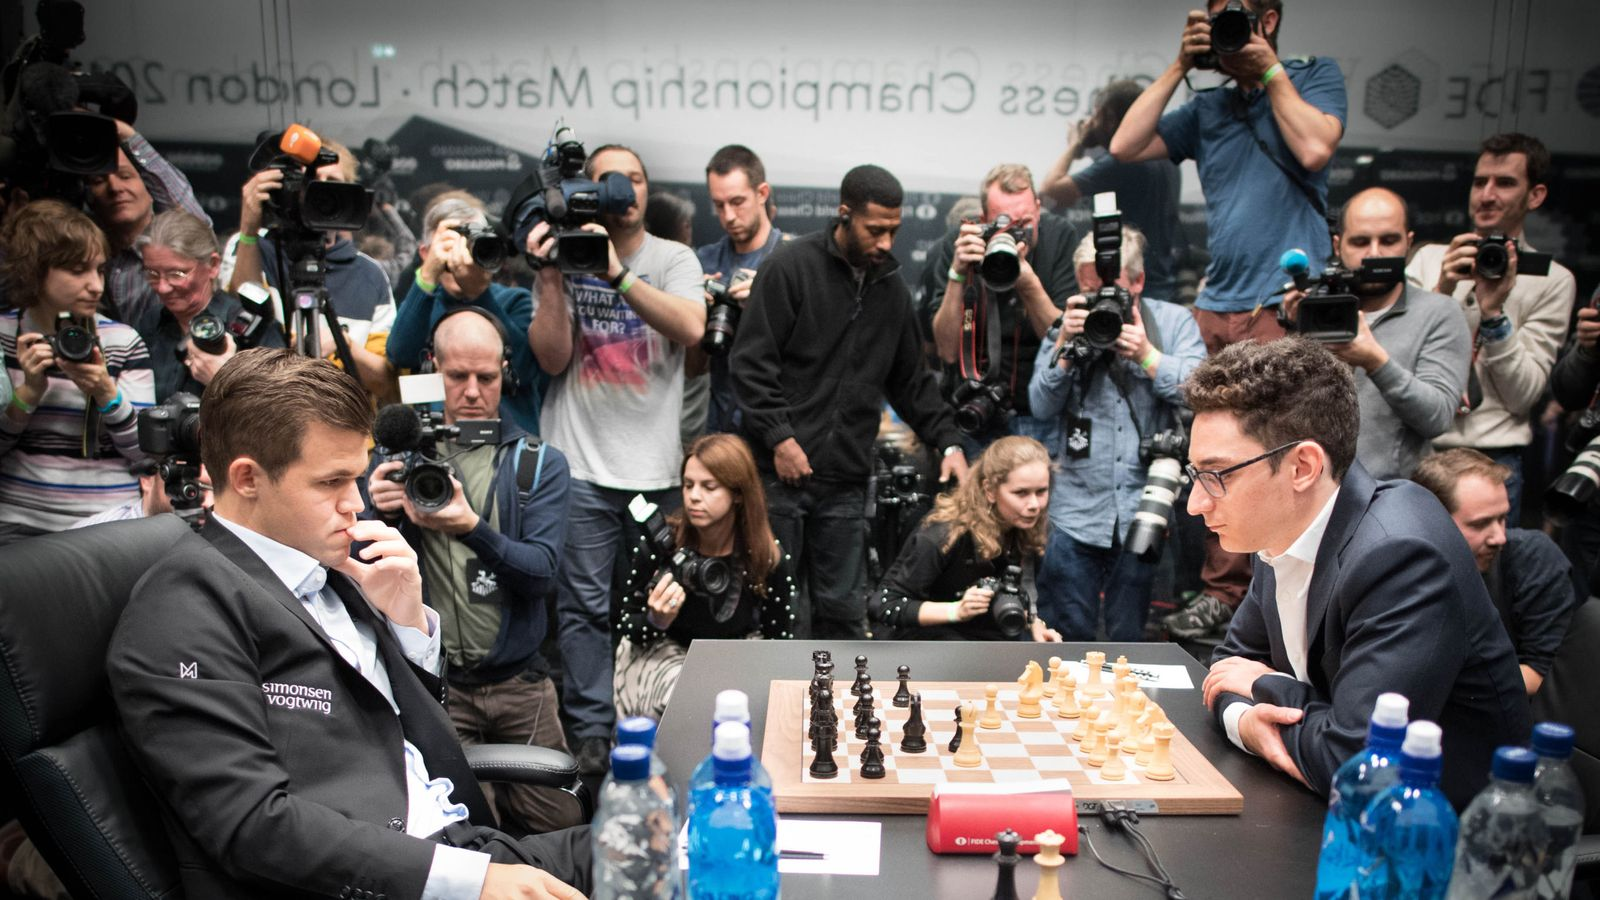 Checkmate! Reigning champion Magnus Carlsen retains world